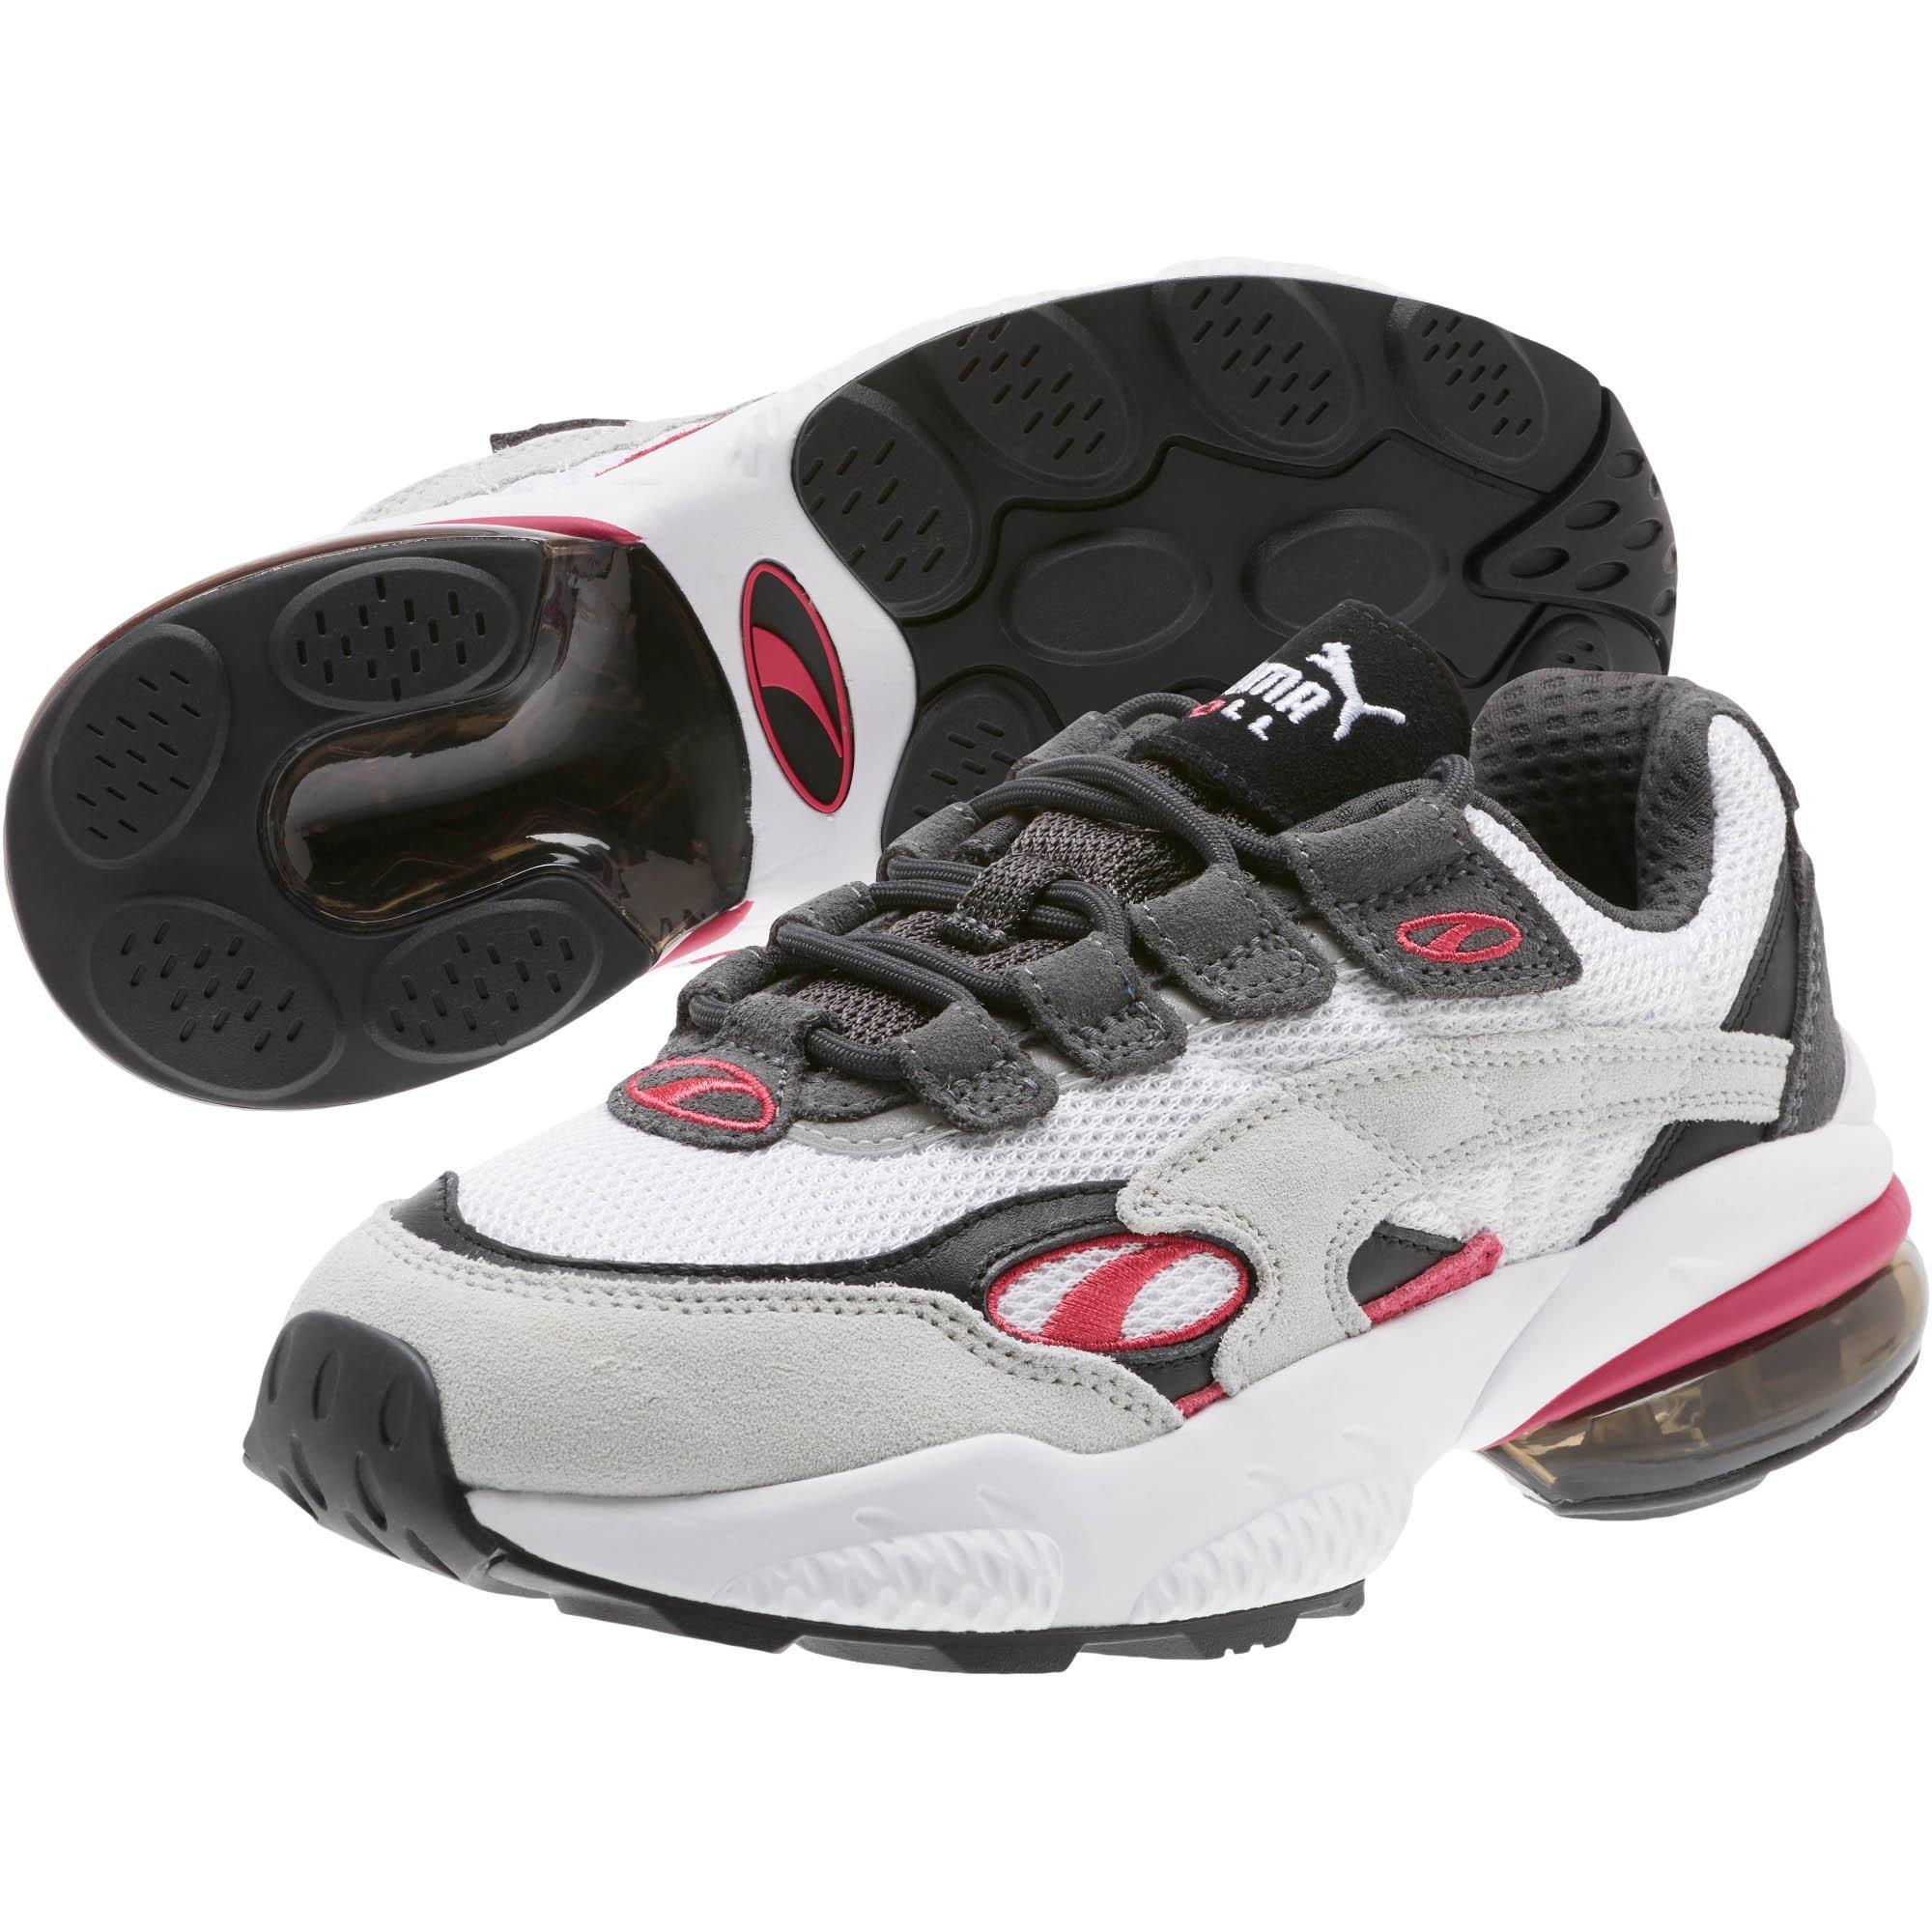 633850d47c66 Lyst - Puma Cell Venom Women s Sneakers